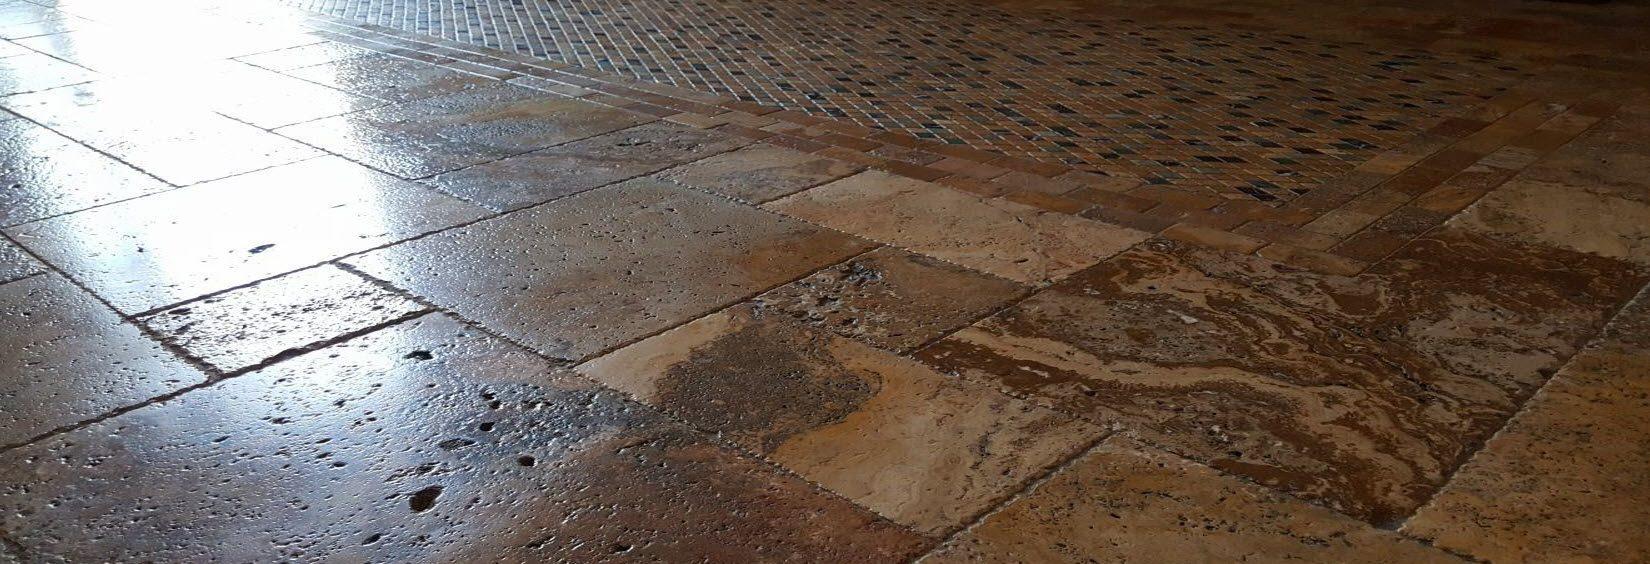 Outdoor tile grout floor cleaning in las vegas nv call our outdoor tile grout floor cleaning in las vegas nv call our professional tile cleaners las vegas floor restoration dailygadgetfo Image collections